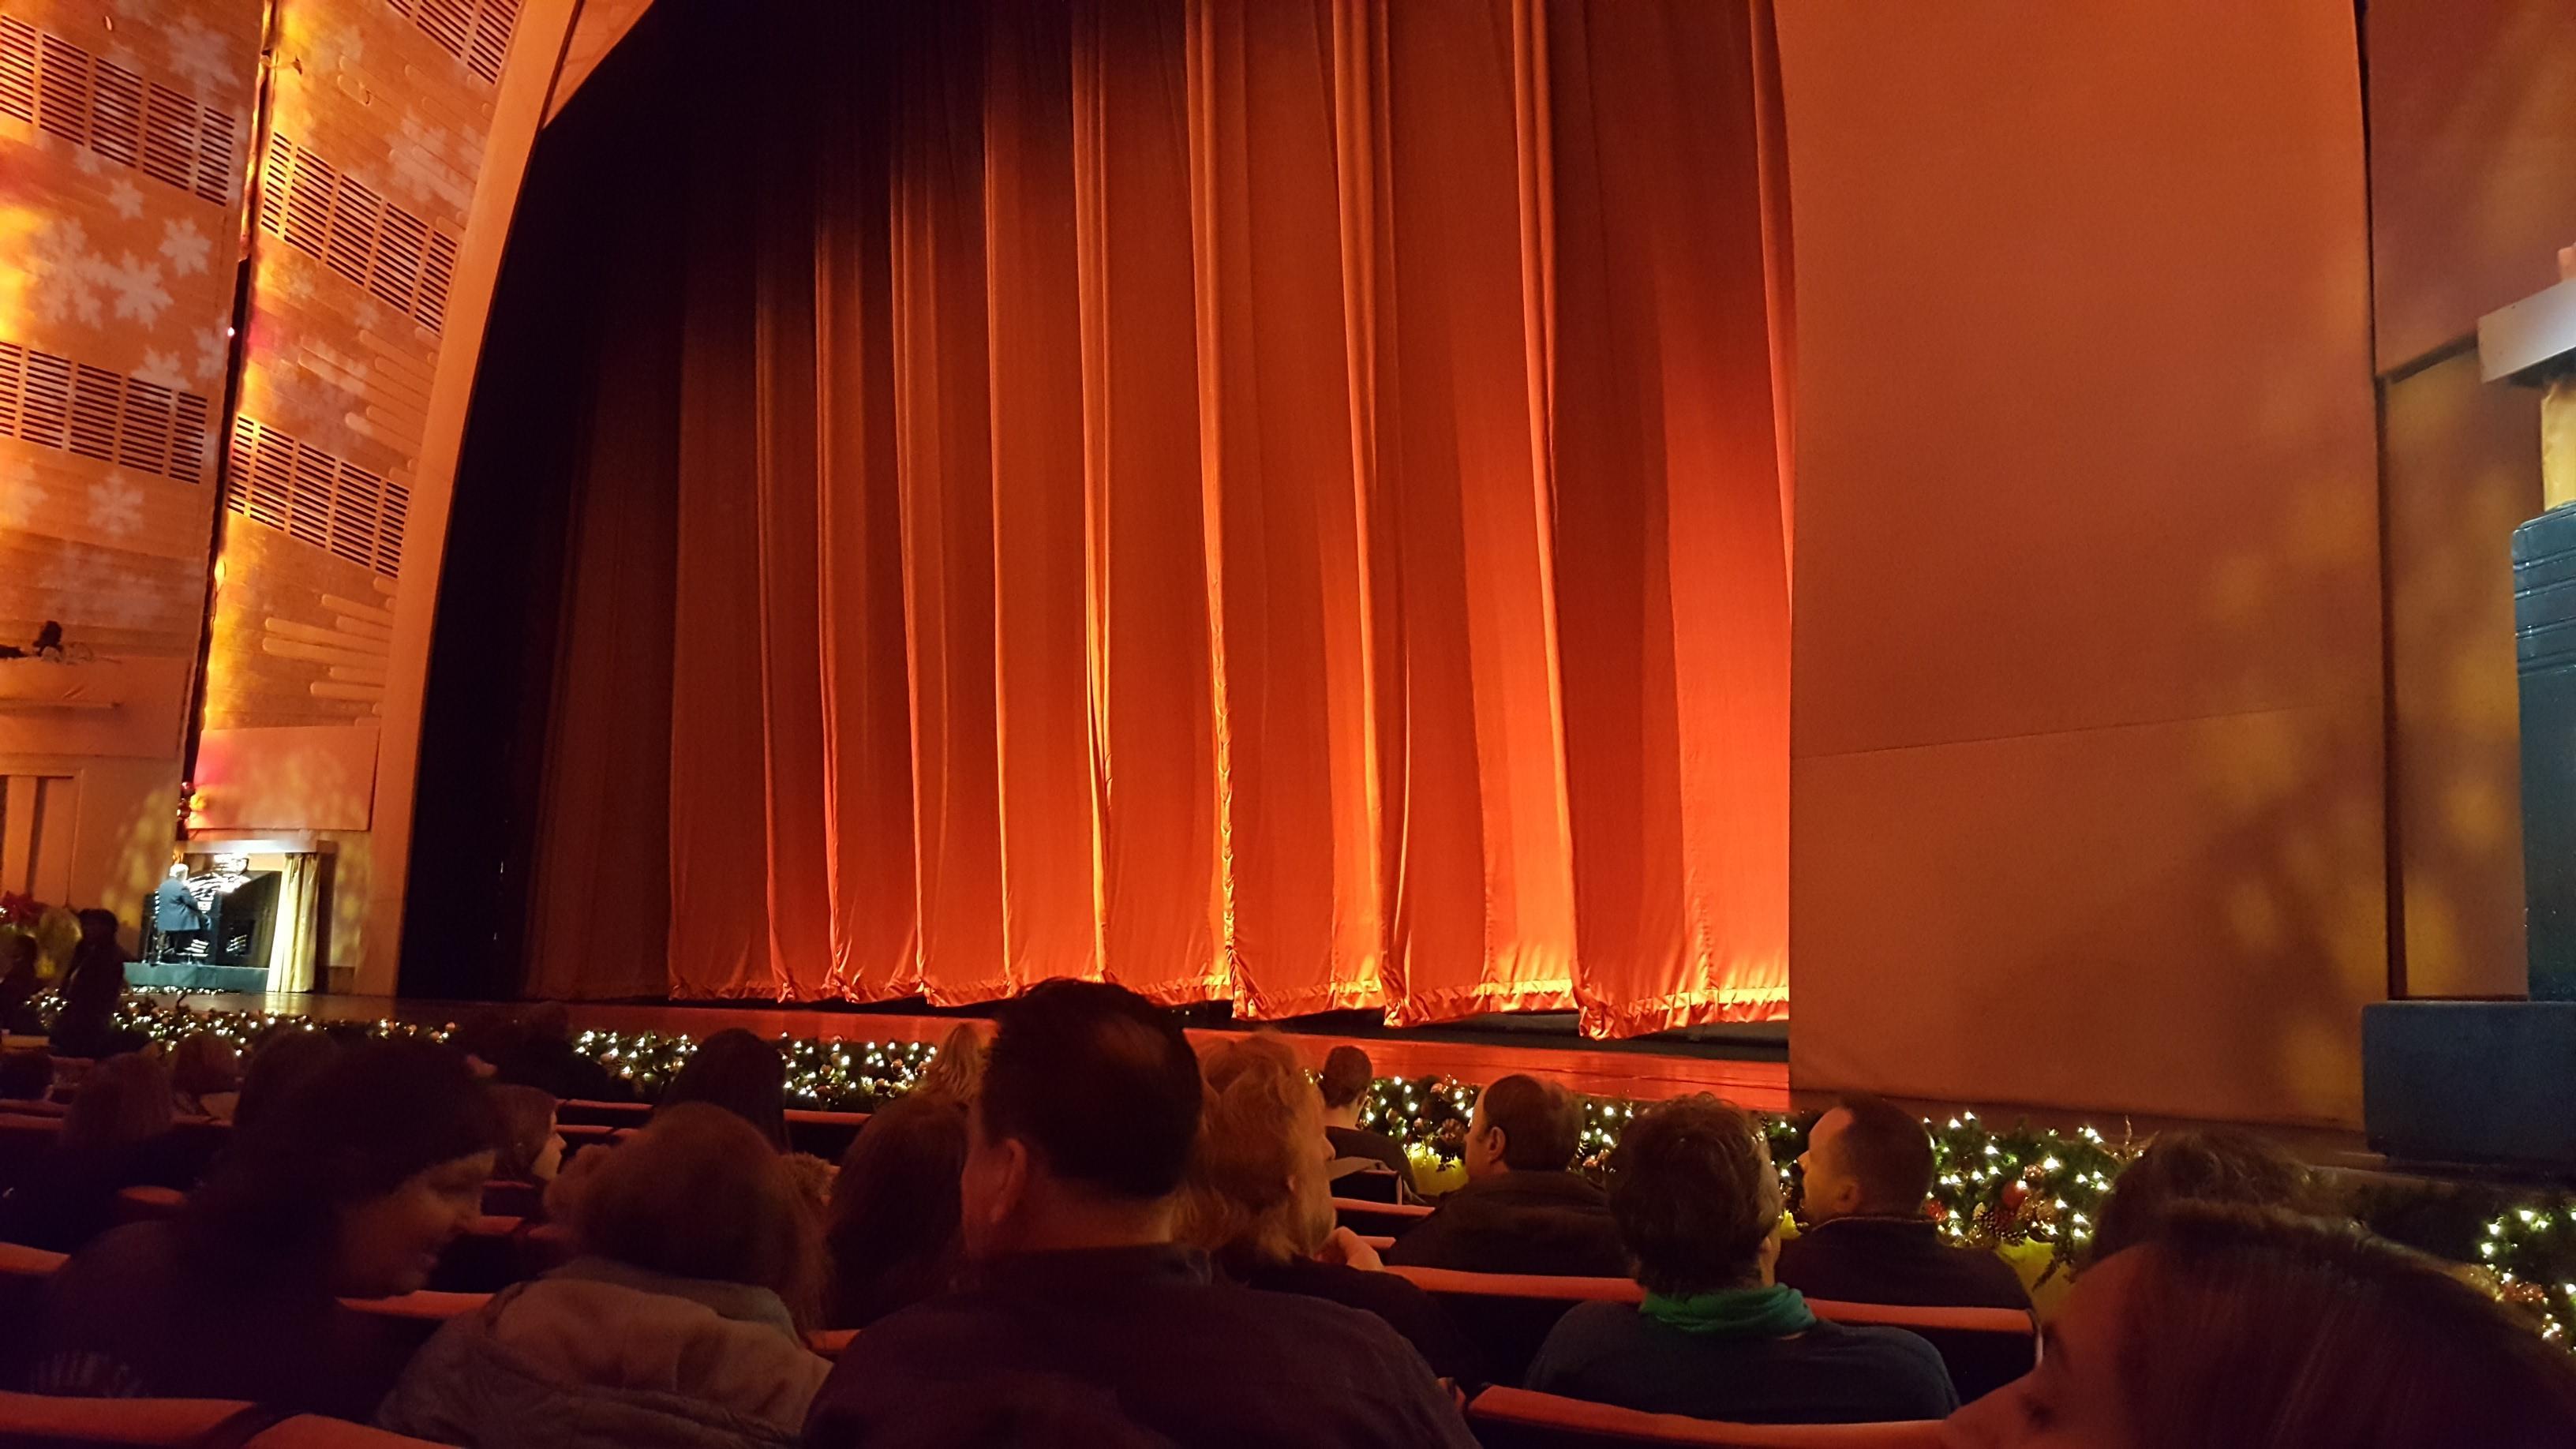 Radio City Music Hall Section Orchestra 2 Row JJ Seat 201